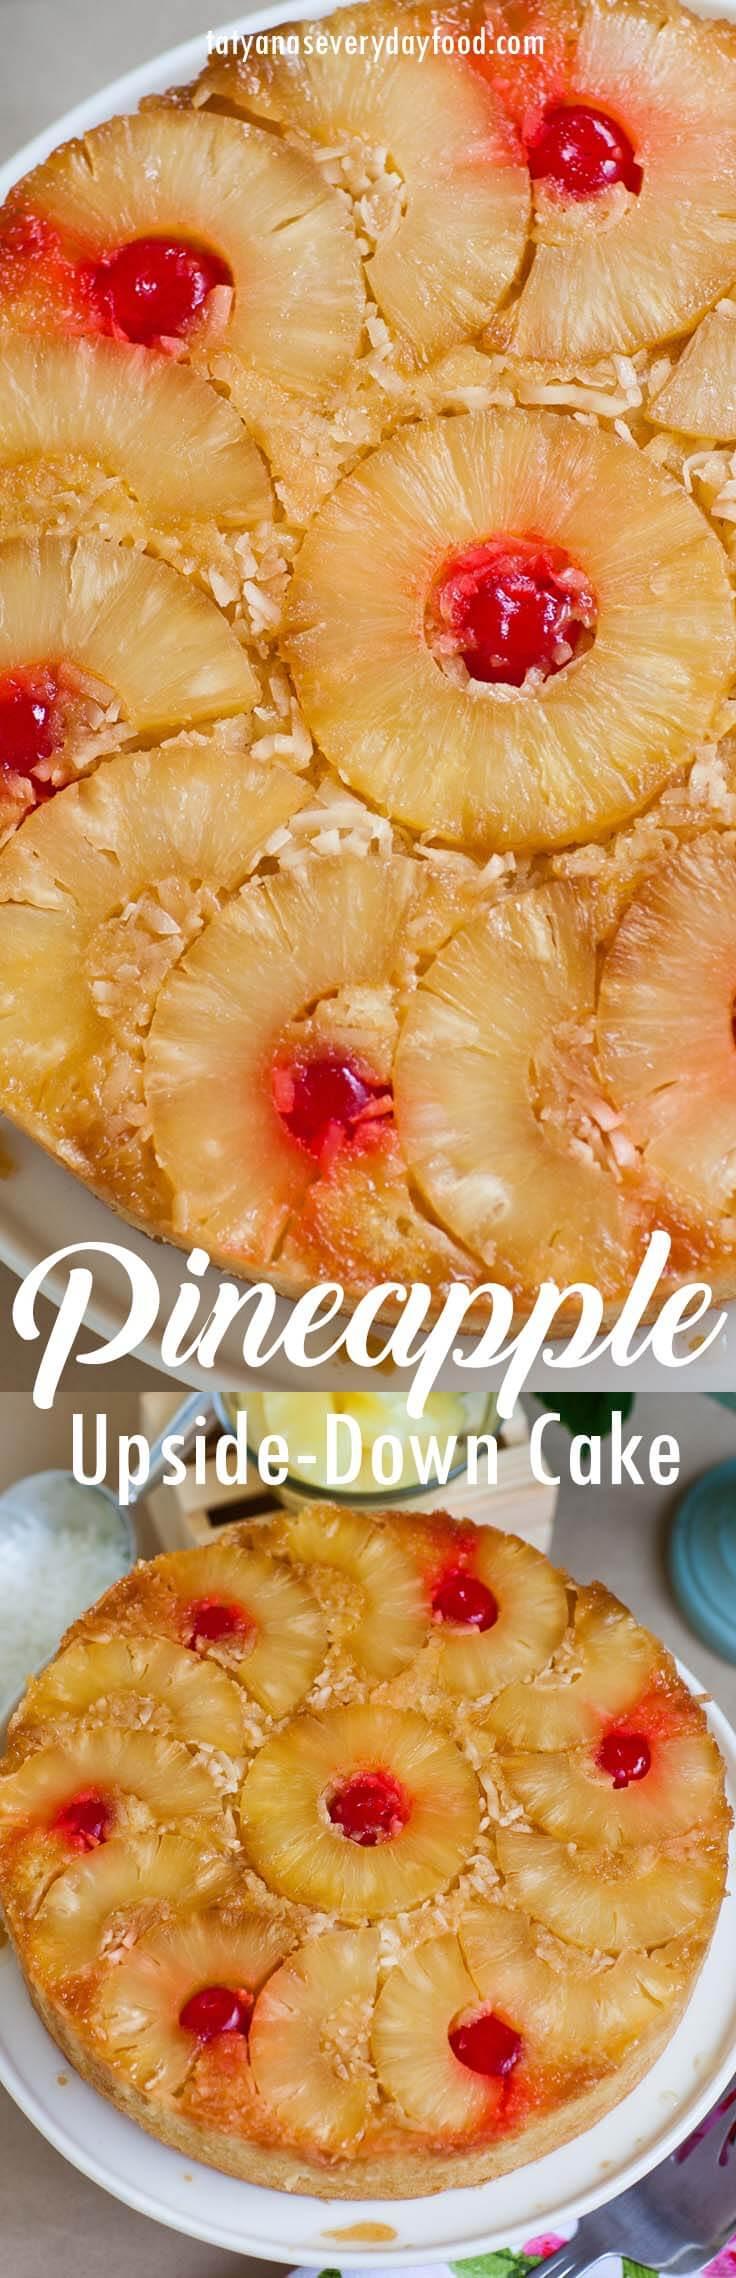 Coconut Upside Down Pineapple Cake video recipe